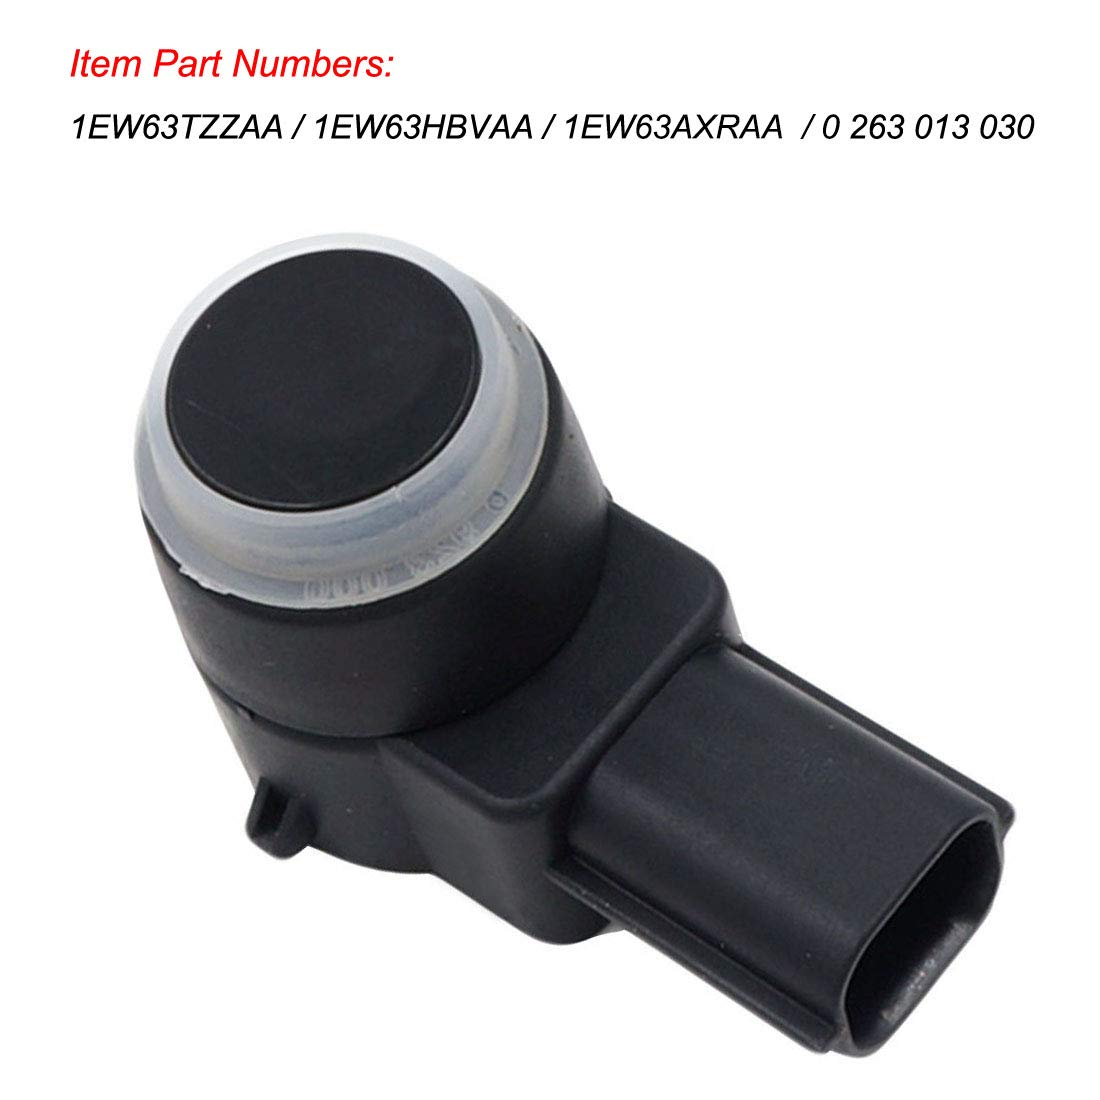 4PCS 1EW63TZZAA Bumper Object PDC Parking Assist Sensor Backup Reverse Sensor Fits for Chrysler Dodge Jeep